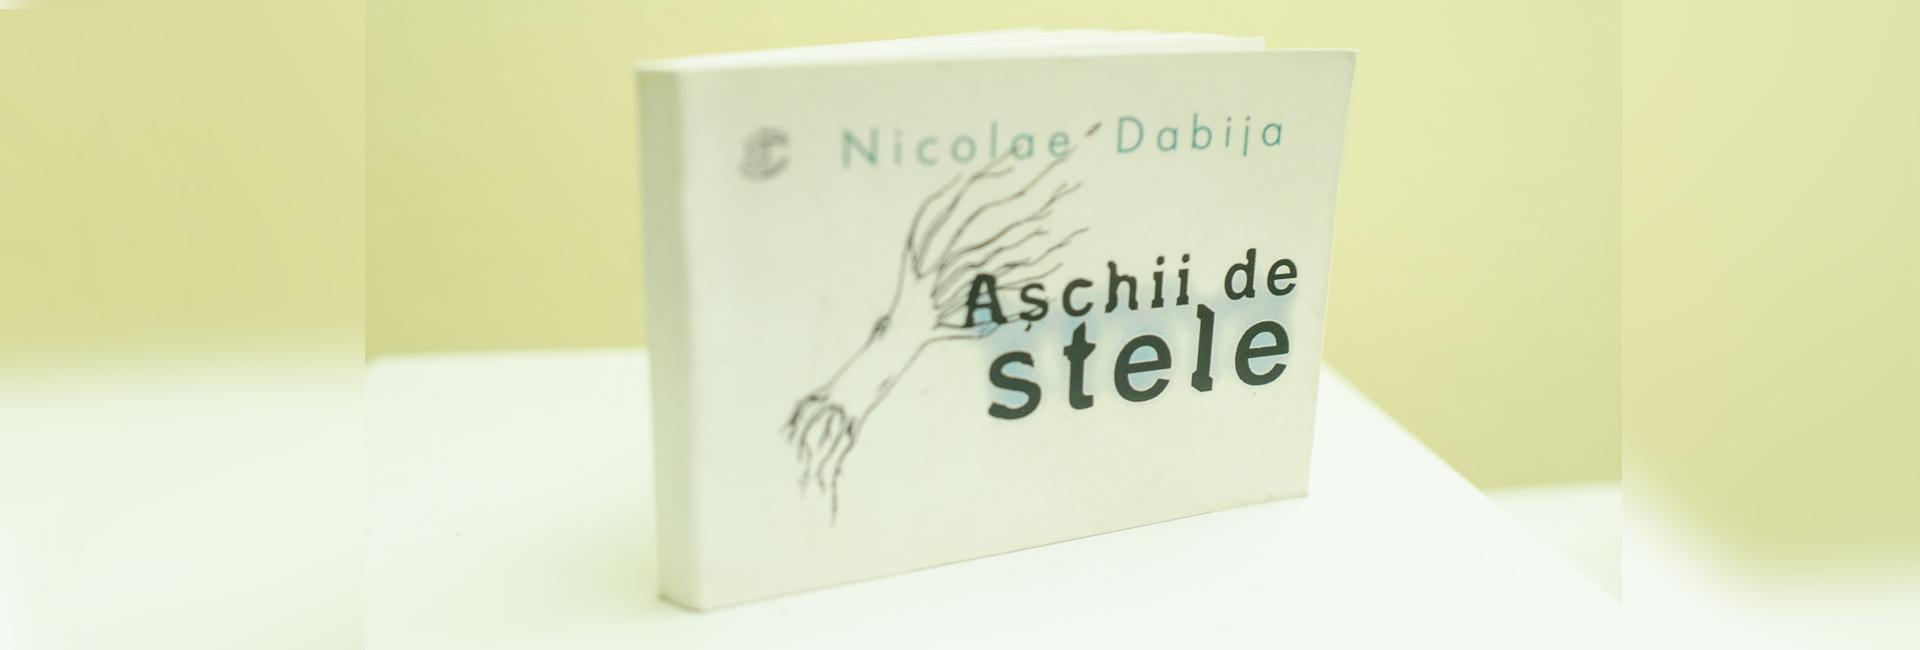 Aschii de stele Nicolae Dabija recenzie Matricea Romaneasca slider